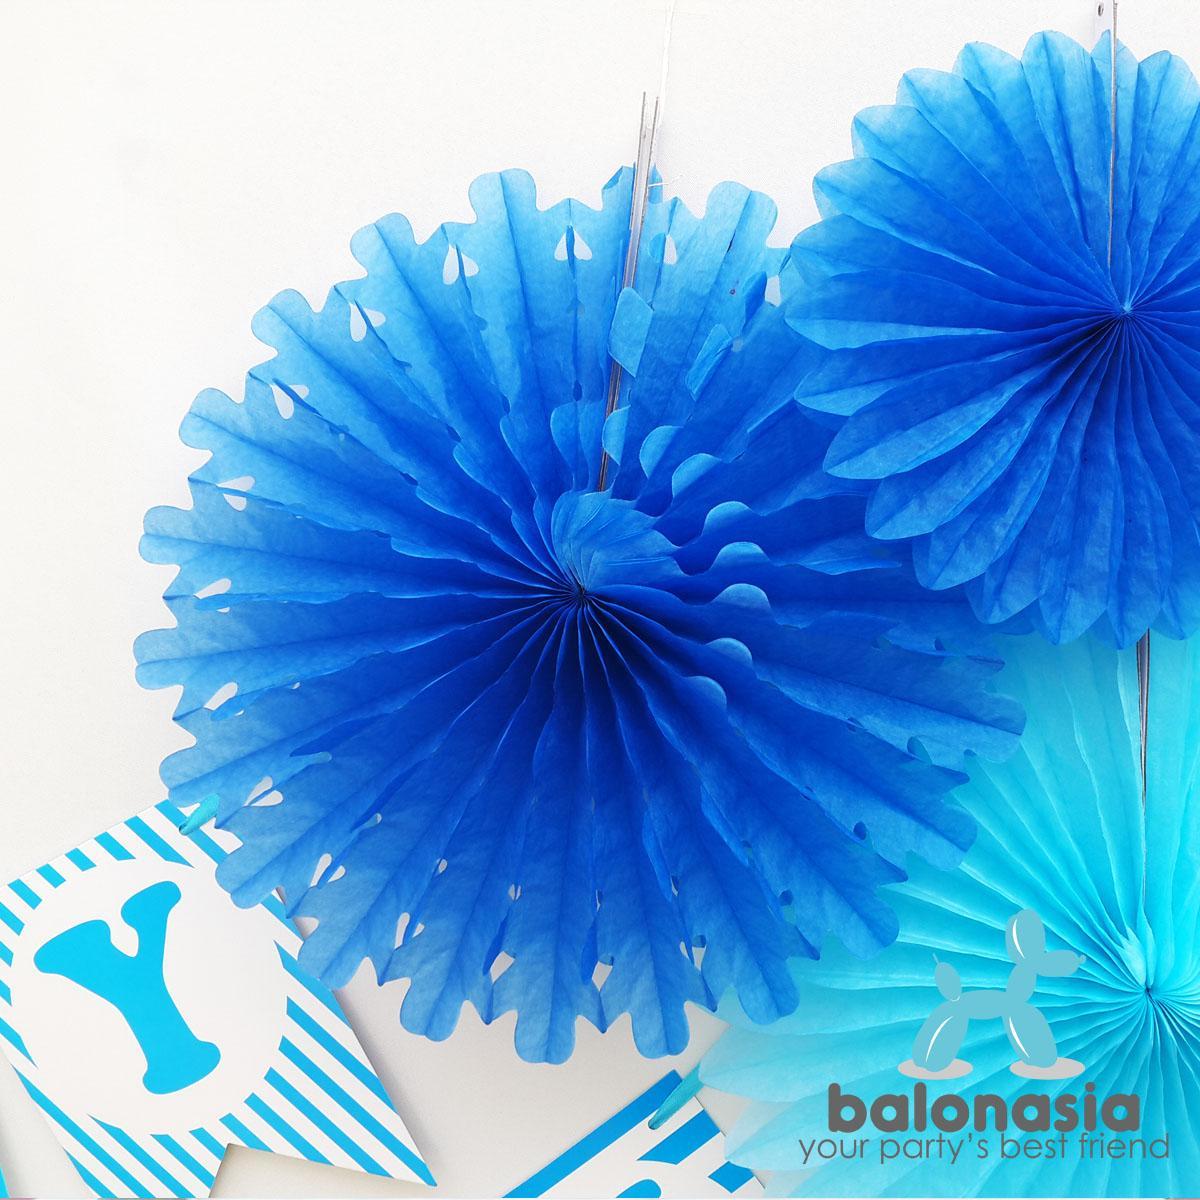 Balonasia Dekorasi Backdrop Set Ulang Tahun Blue Multipattern Tirai Foil